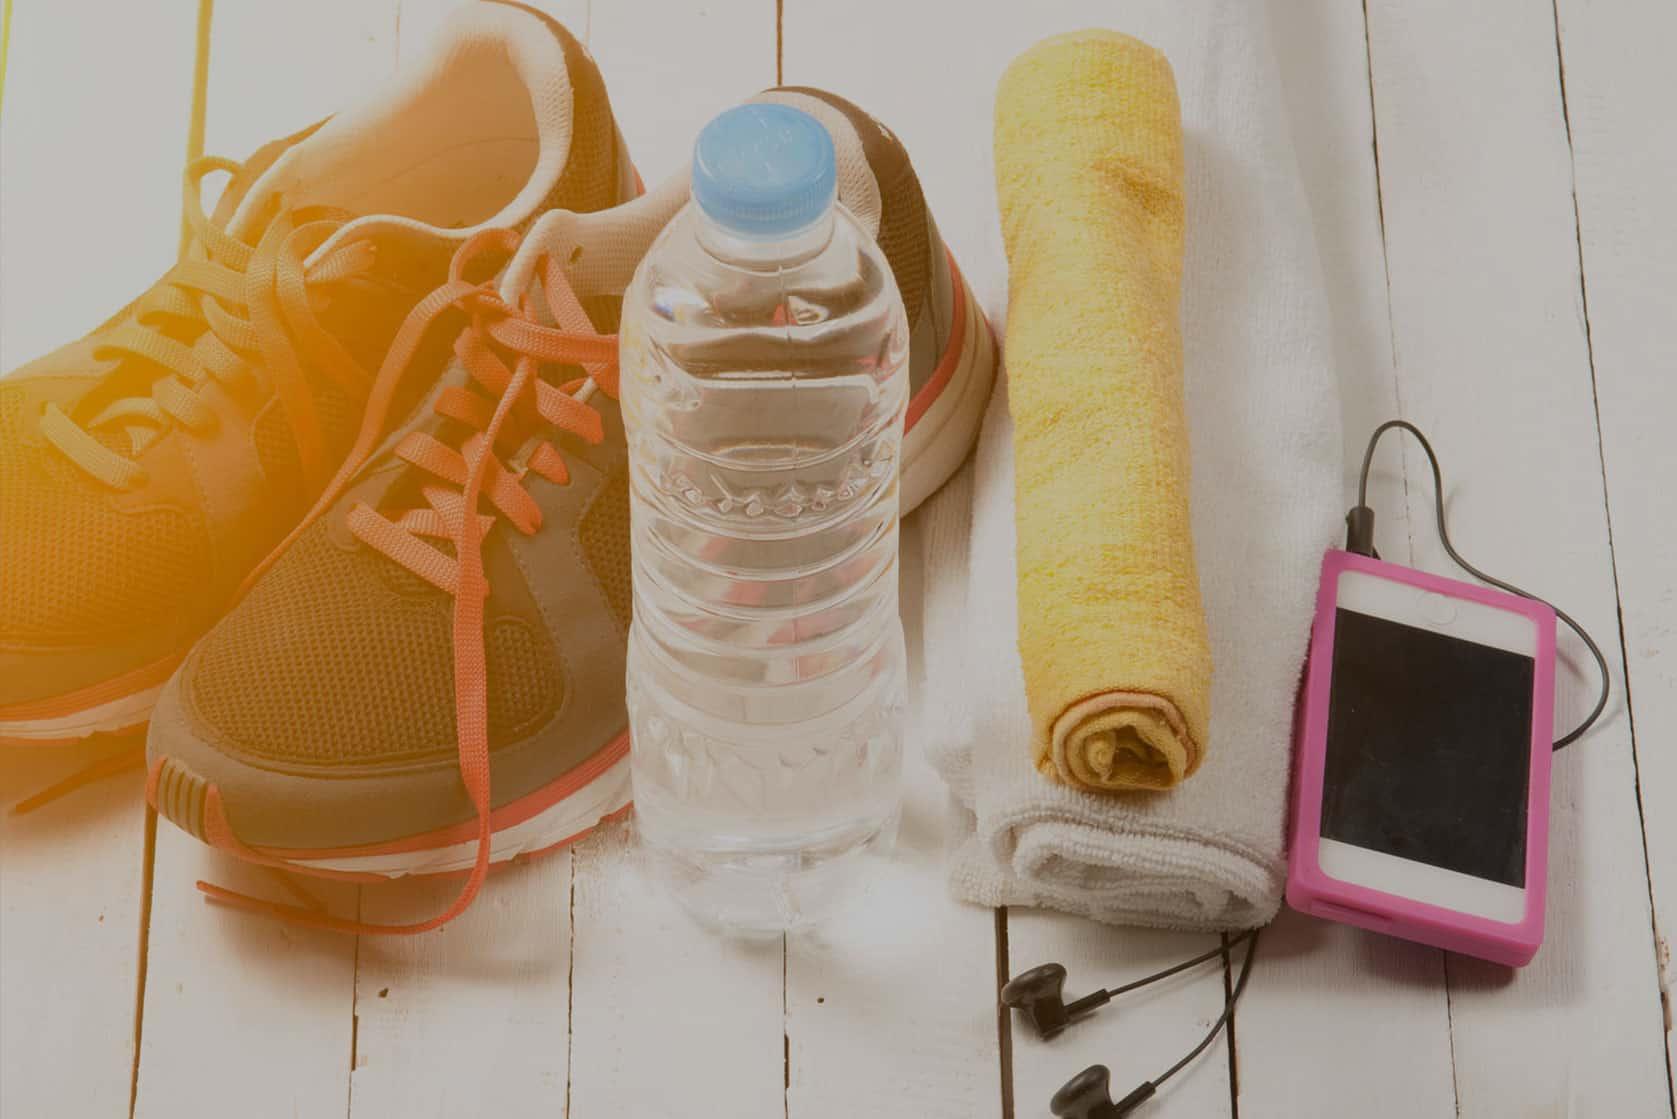 Week 1 of 8 (4-Day Body Transforming Workout)